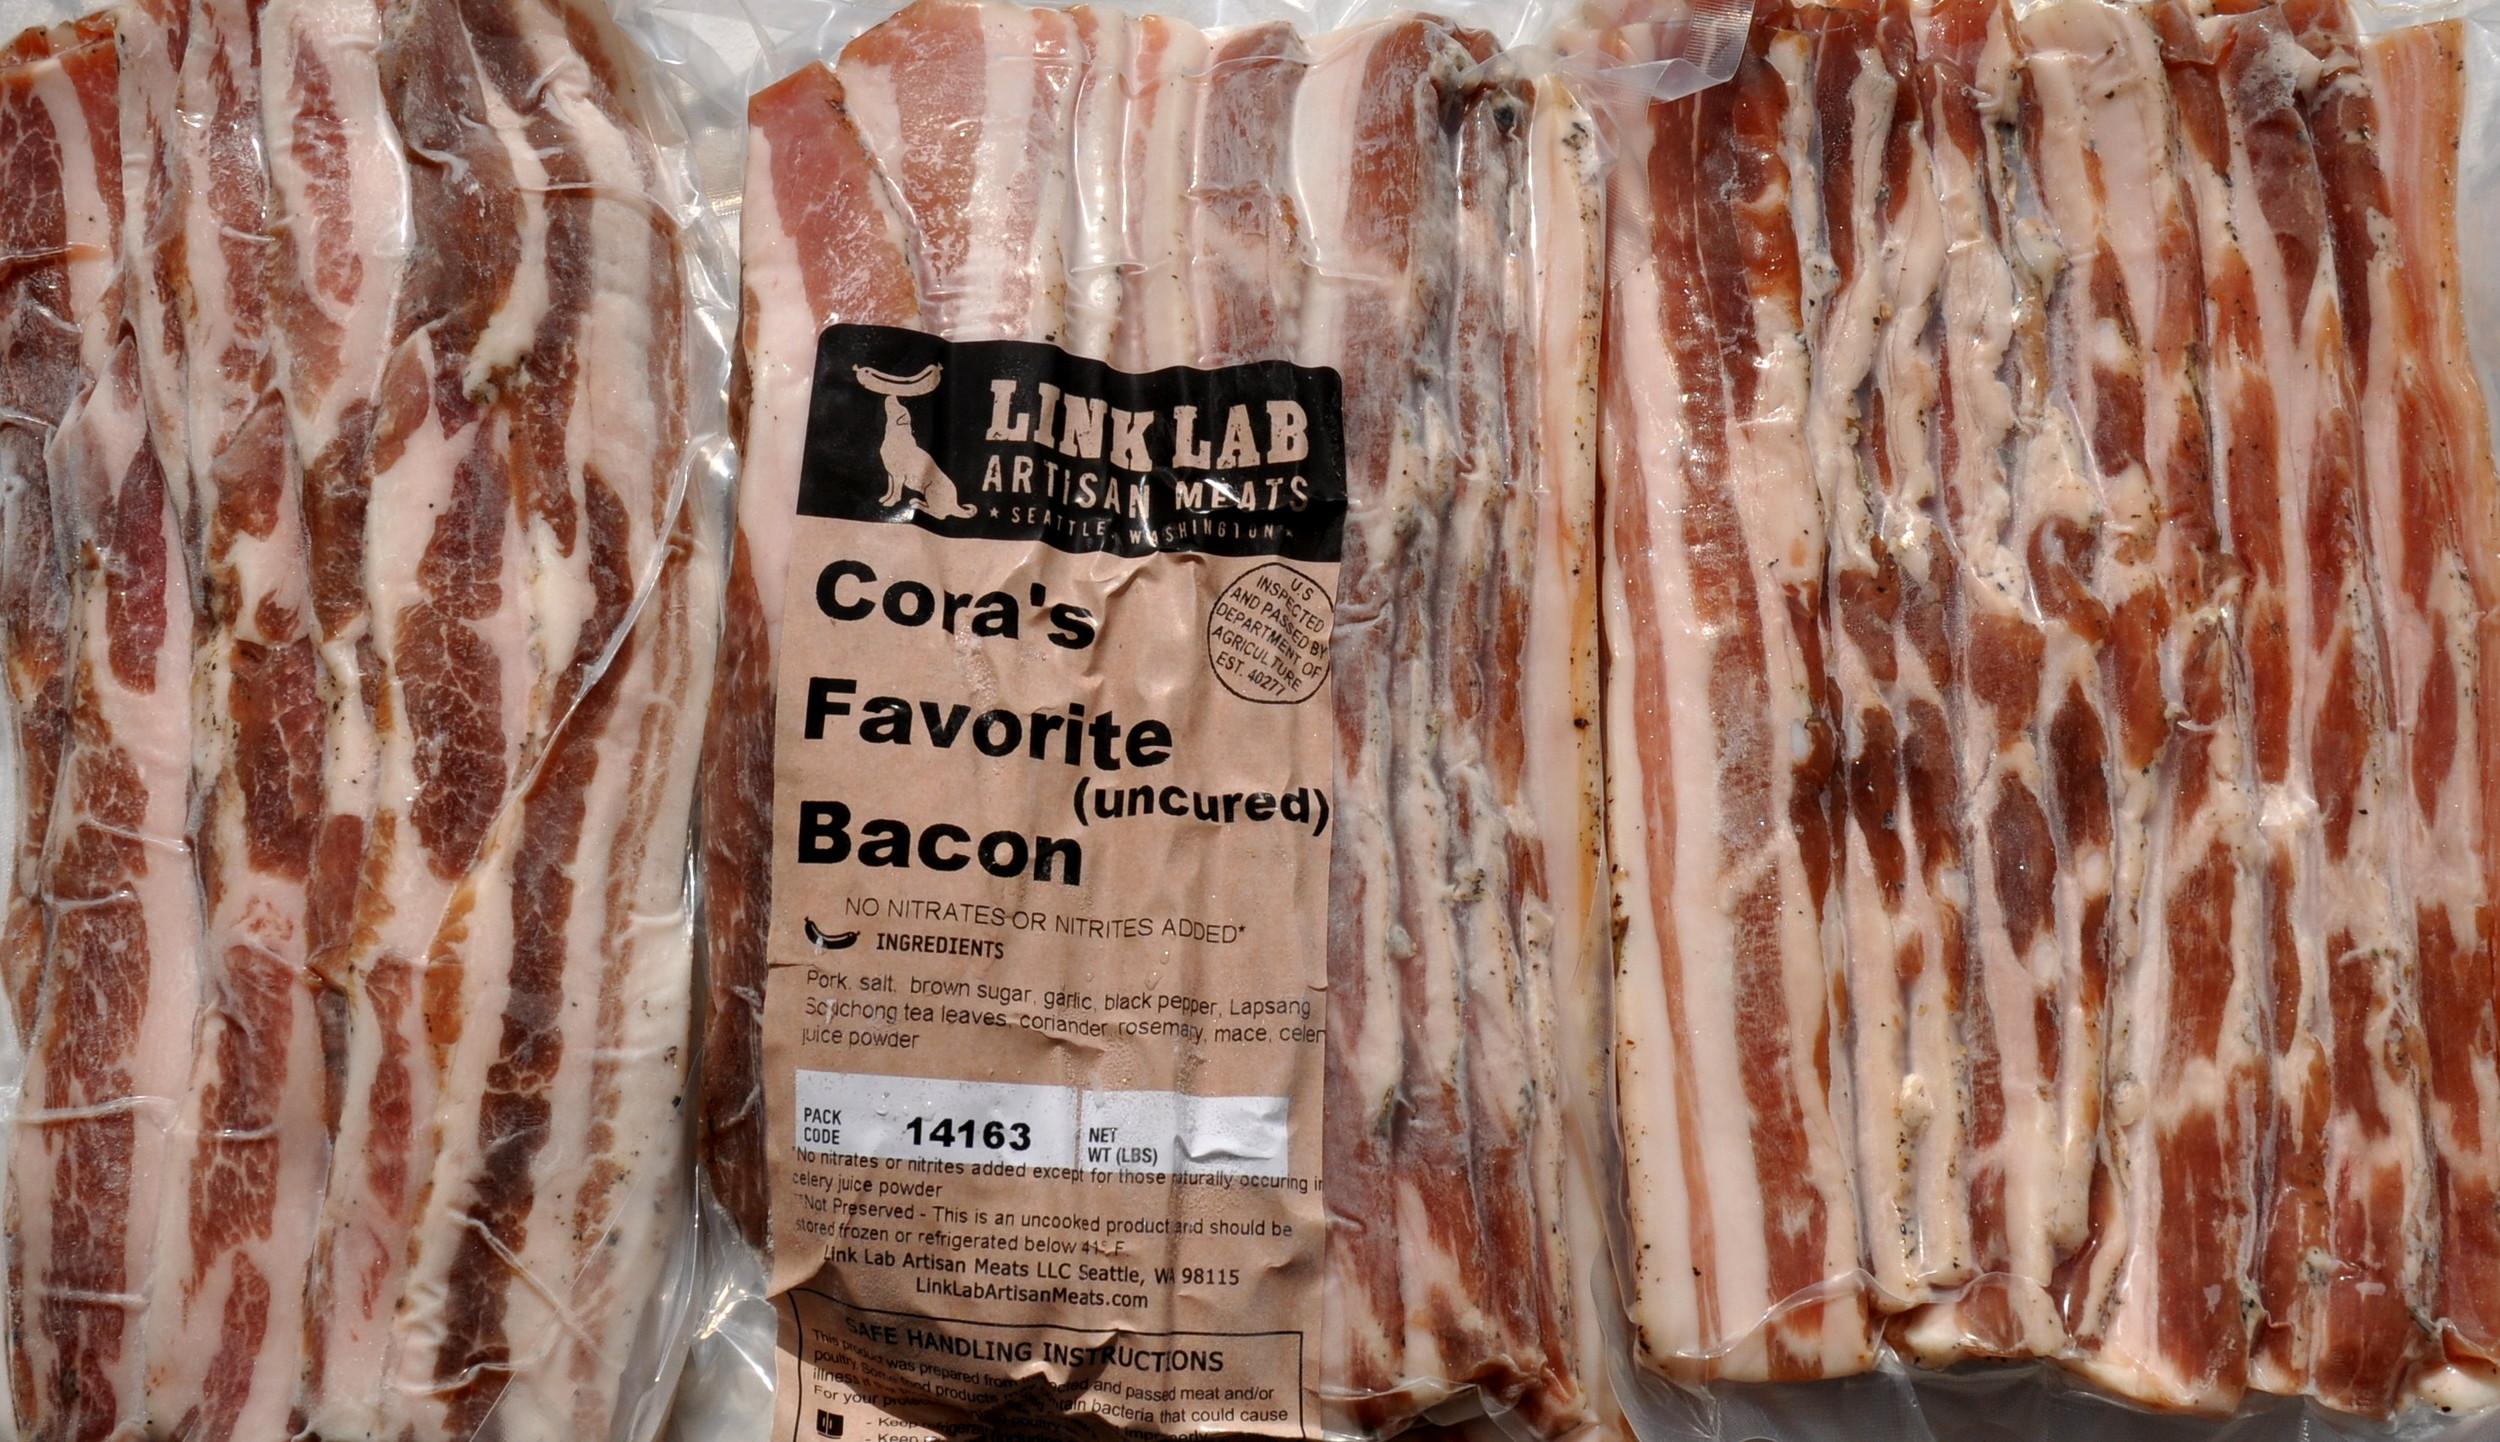 Spiced bacon from Sky Valley Family Farm. Photo copyright 2014 by Zachary D. Lyons.